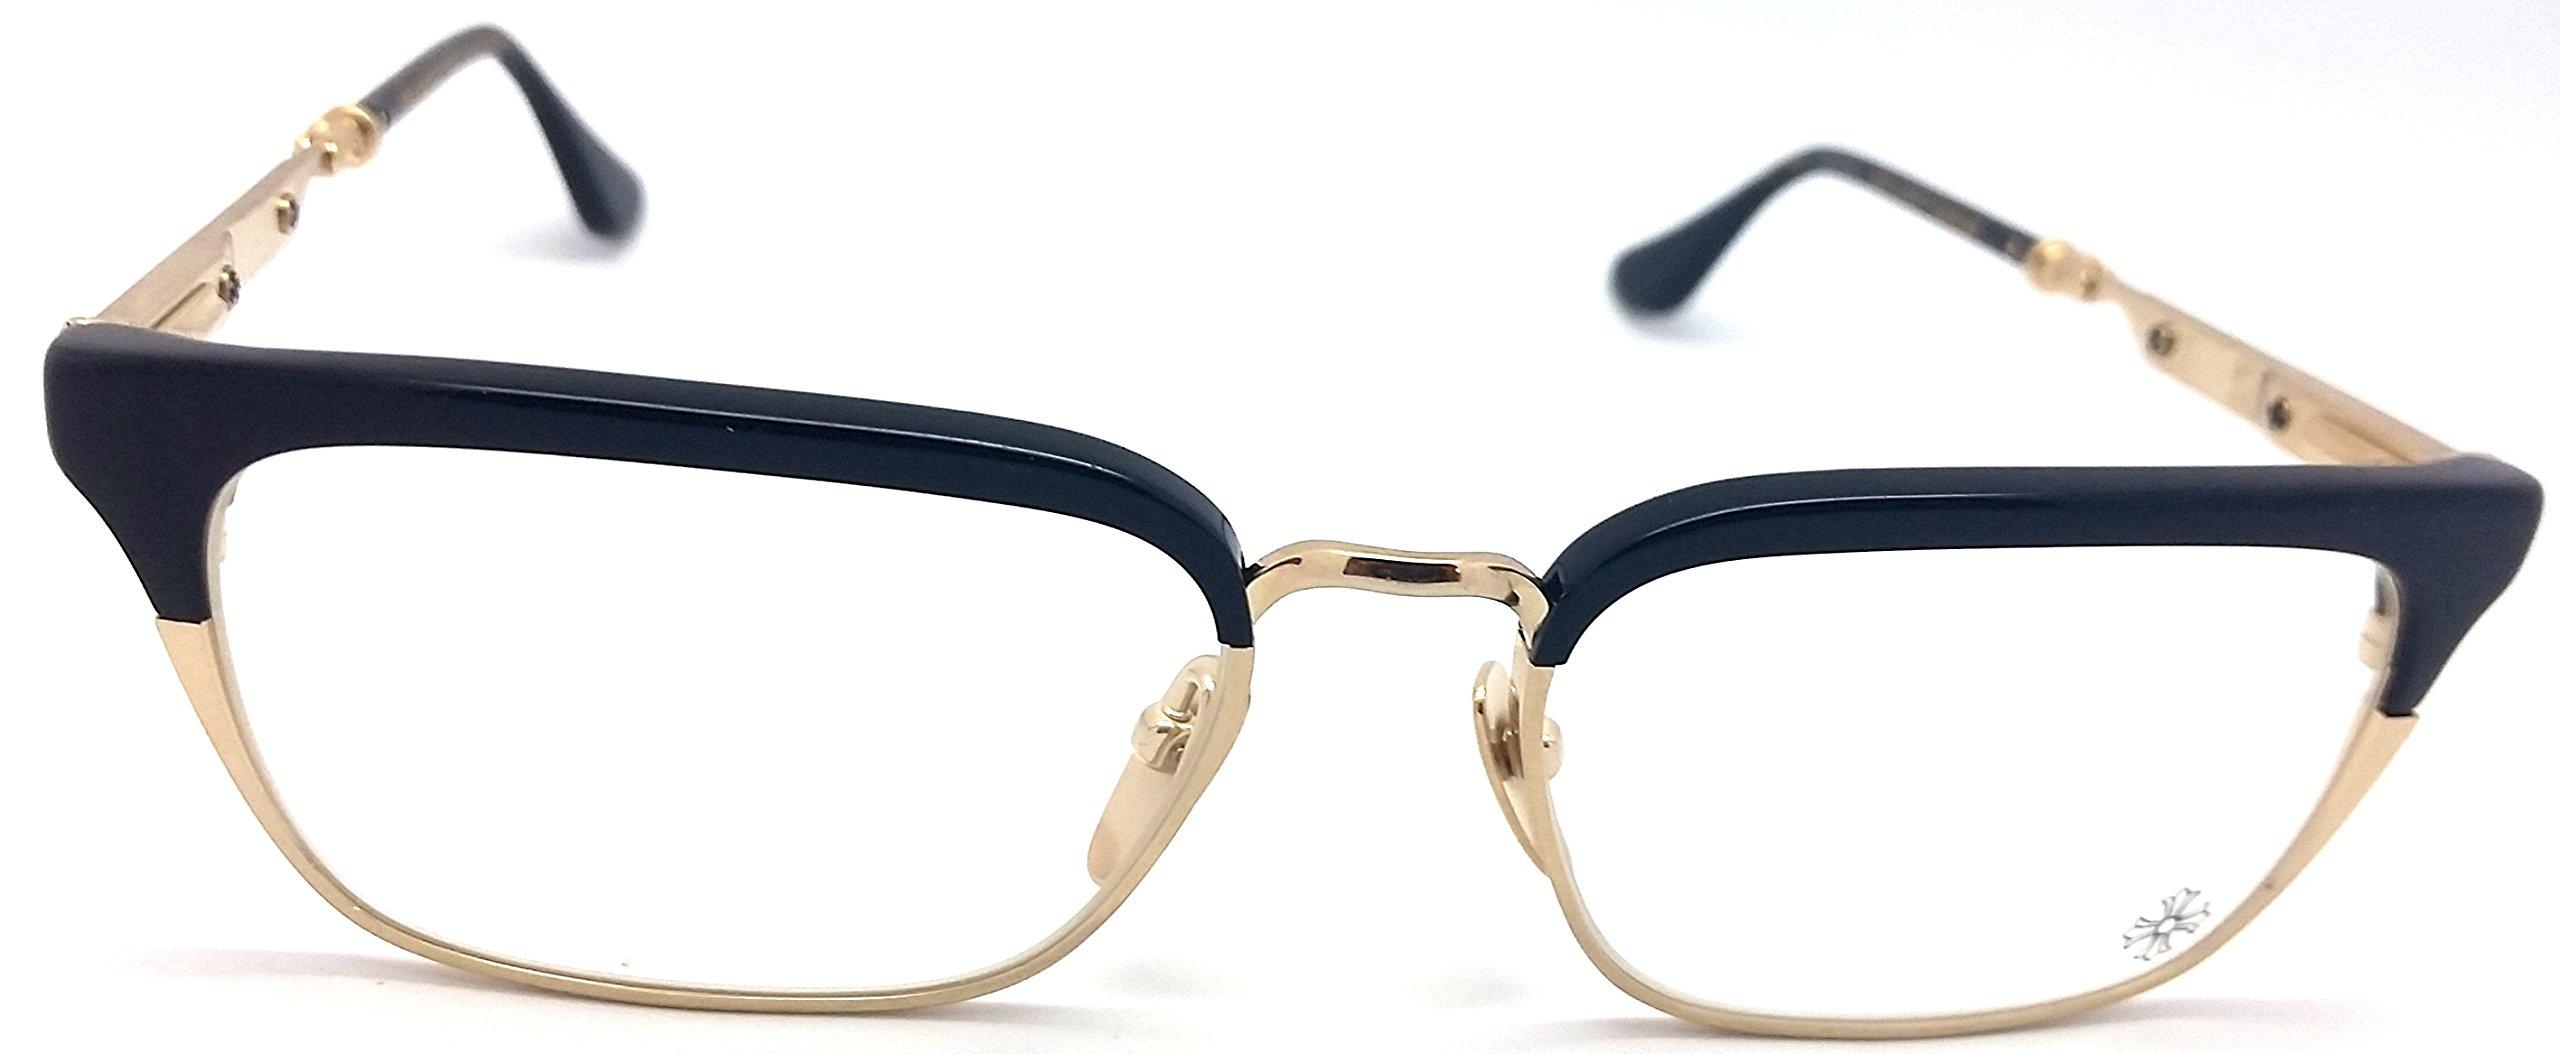 Best Deals On Chrome Hearts Glasses - SuperOffers.com